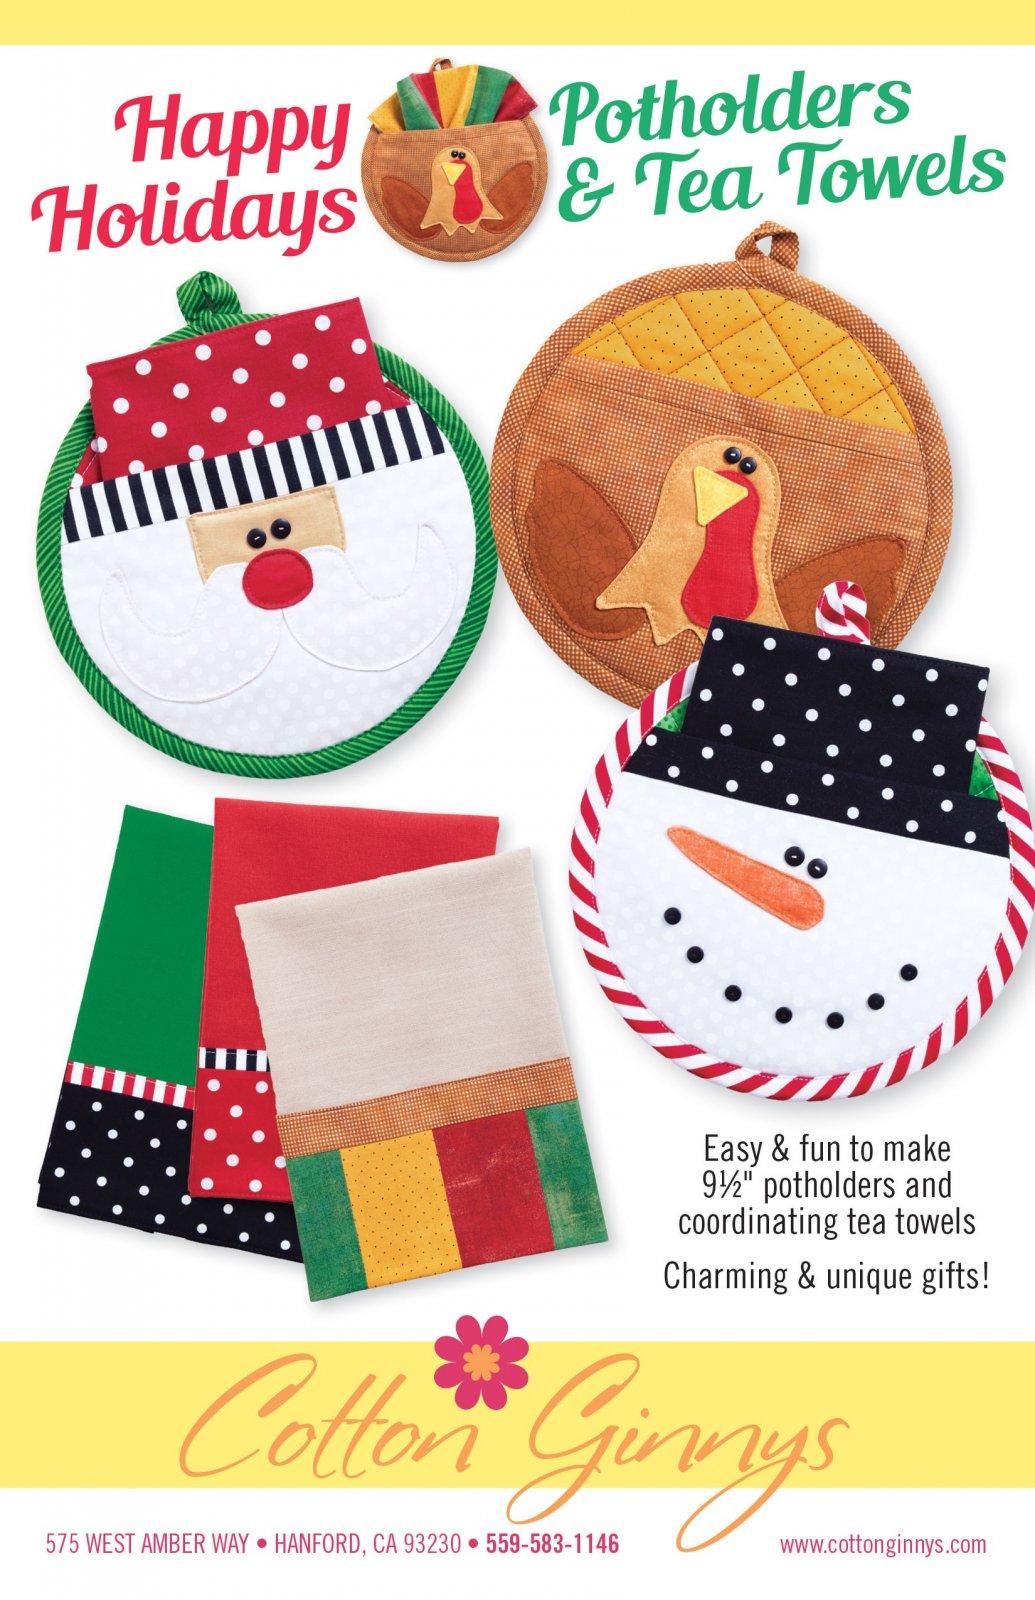 Happy Holidays Potholders & Tea Towels